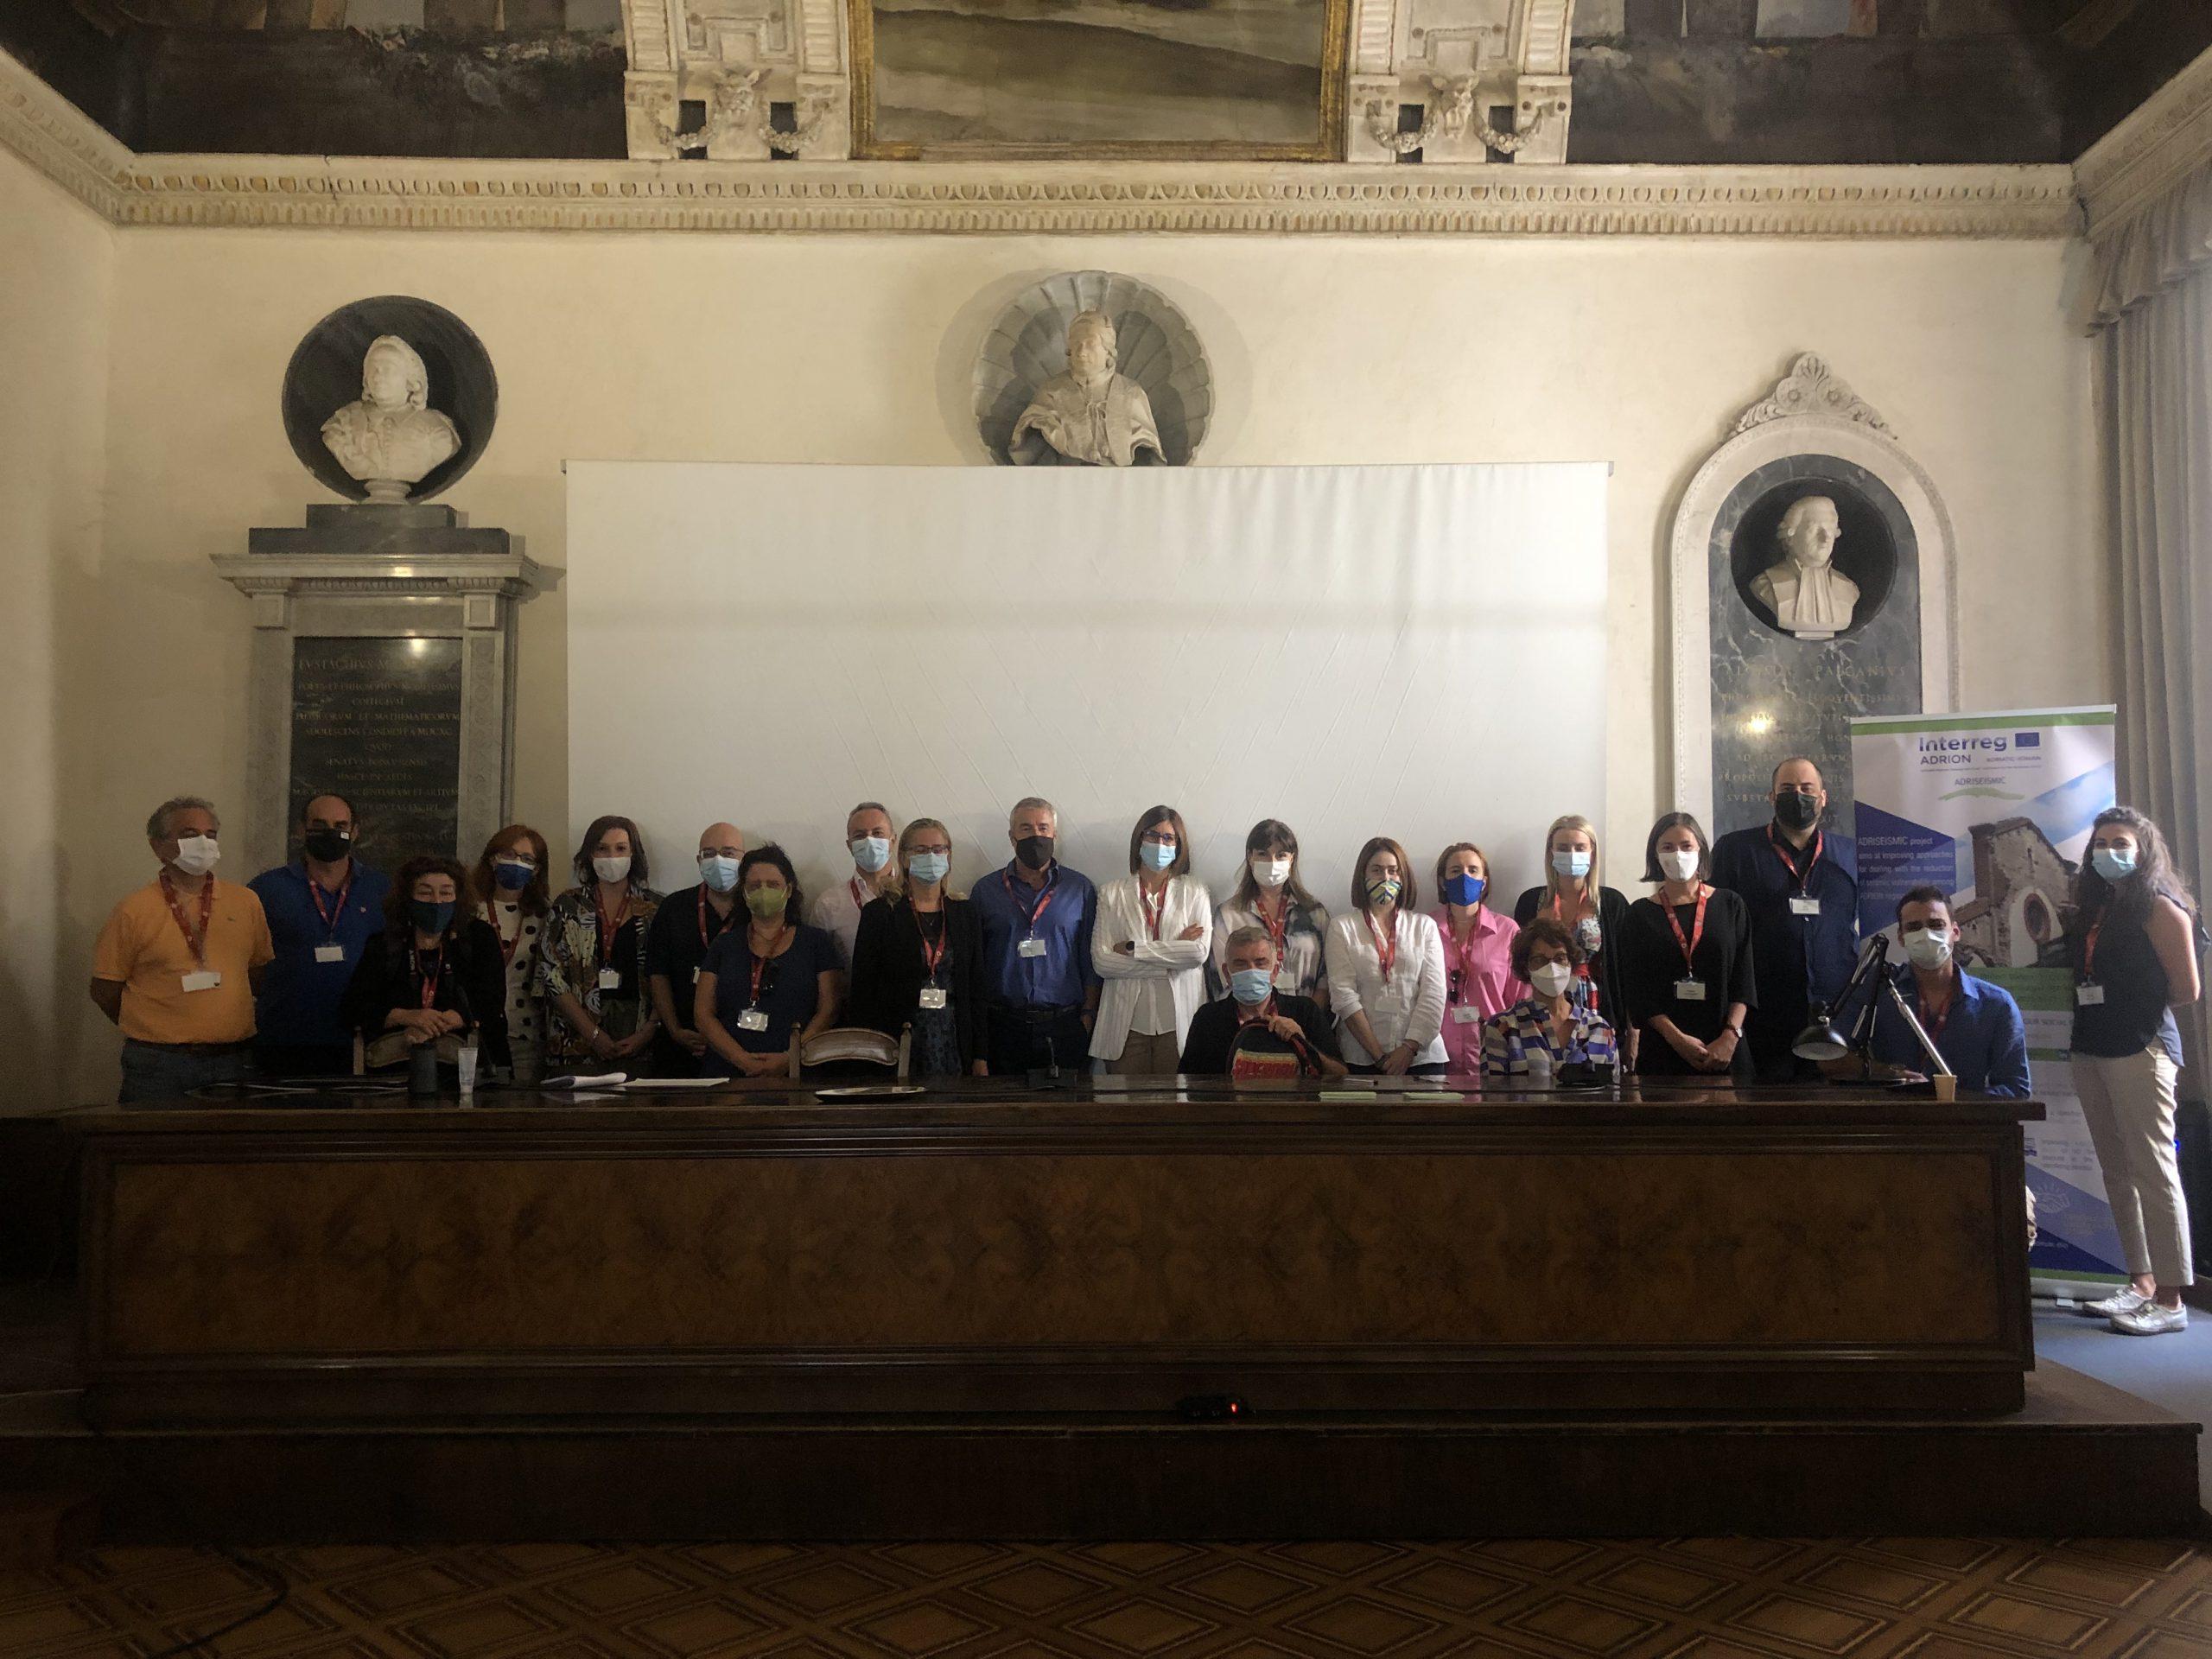 Italian study visit palazzo poggi sala ulisse bologna adriseismic